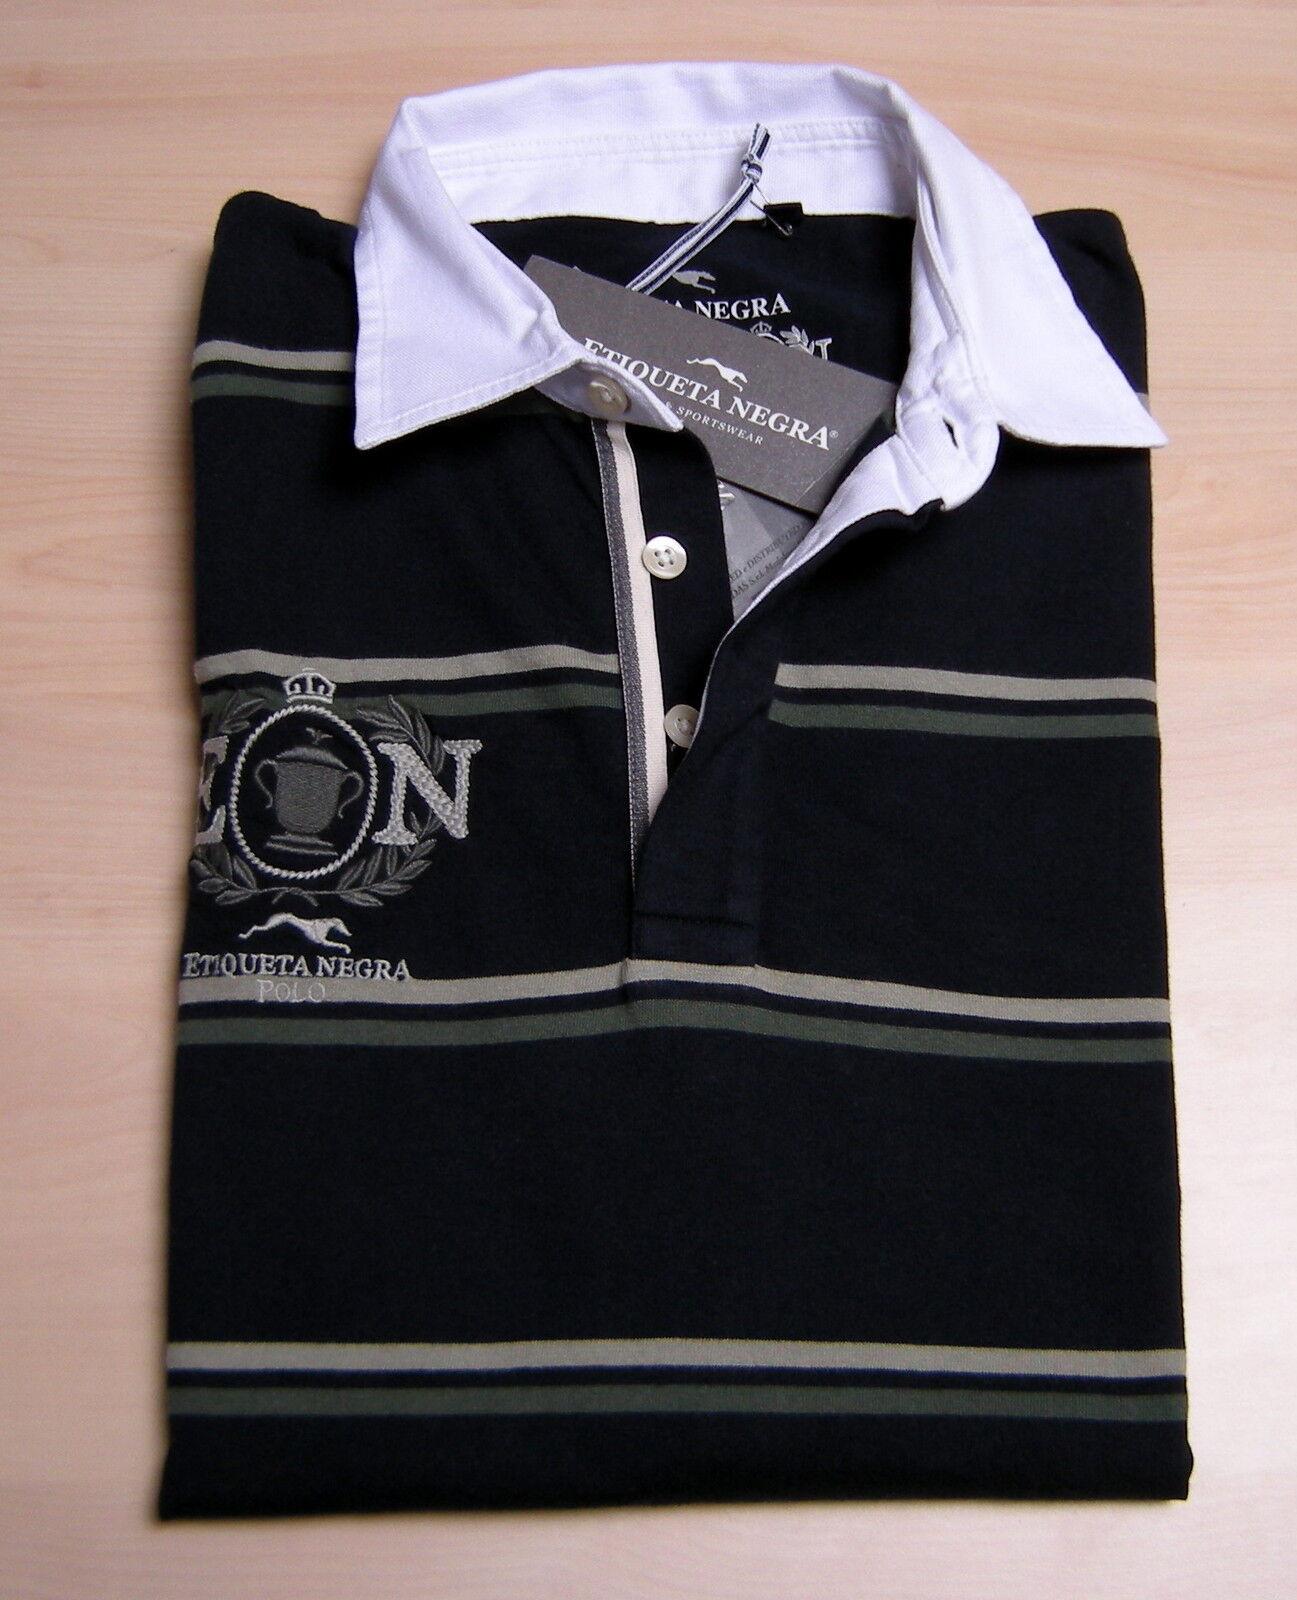 Jersey rugby ETIQUETA NEGRA Man Men Embroidery jersey 100% Original Nwt blueE